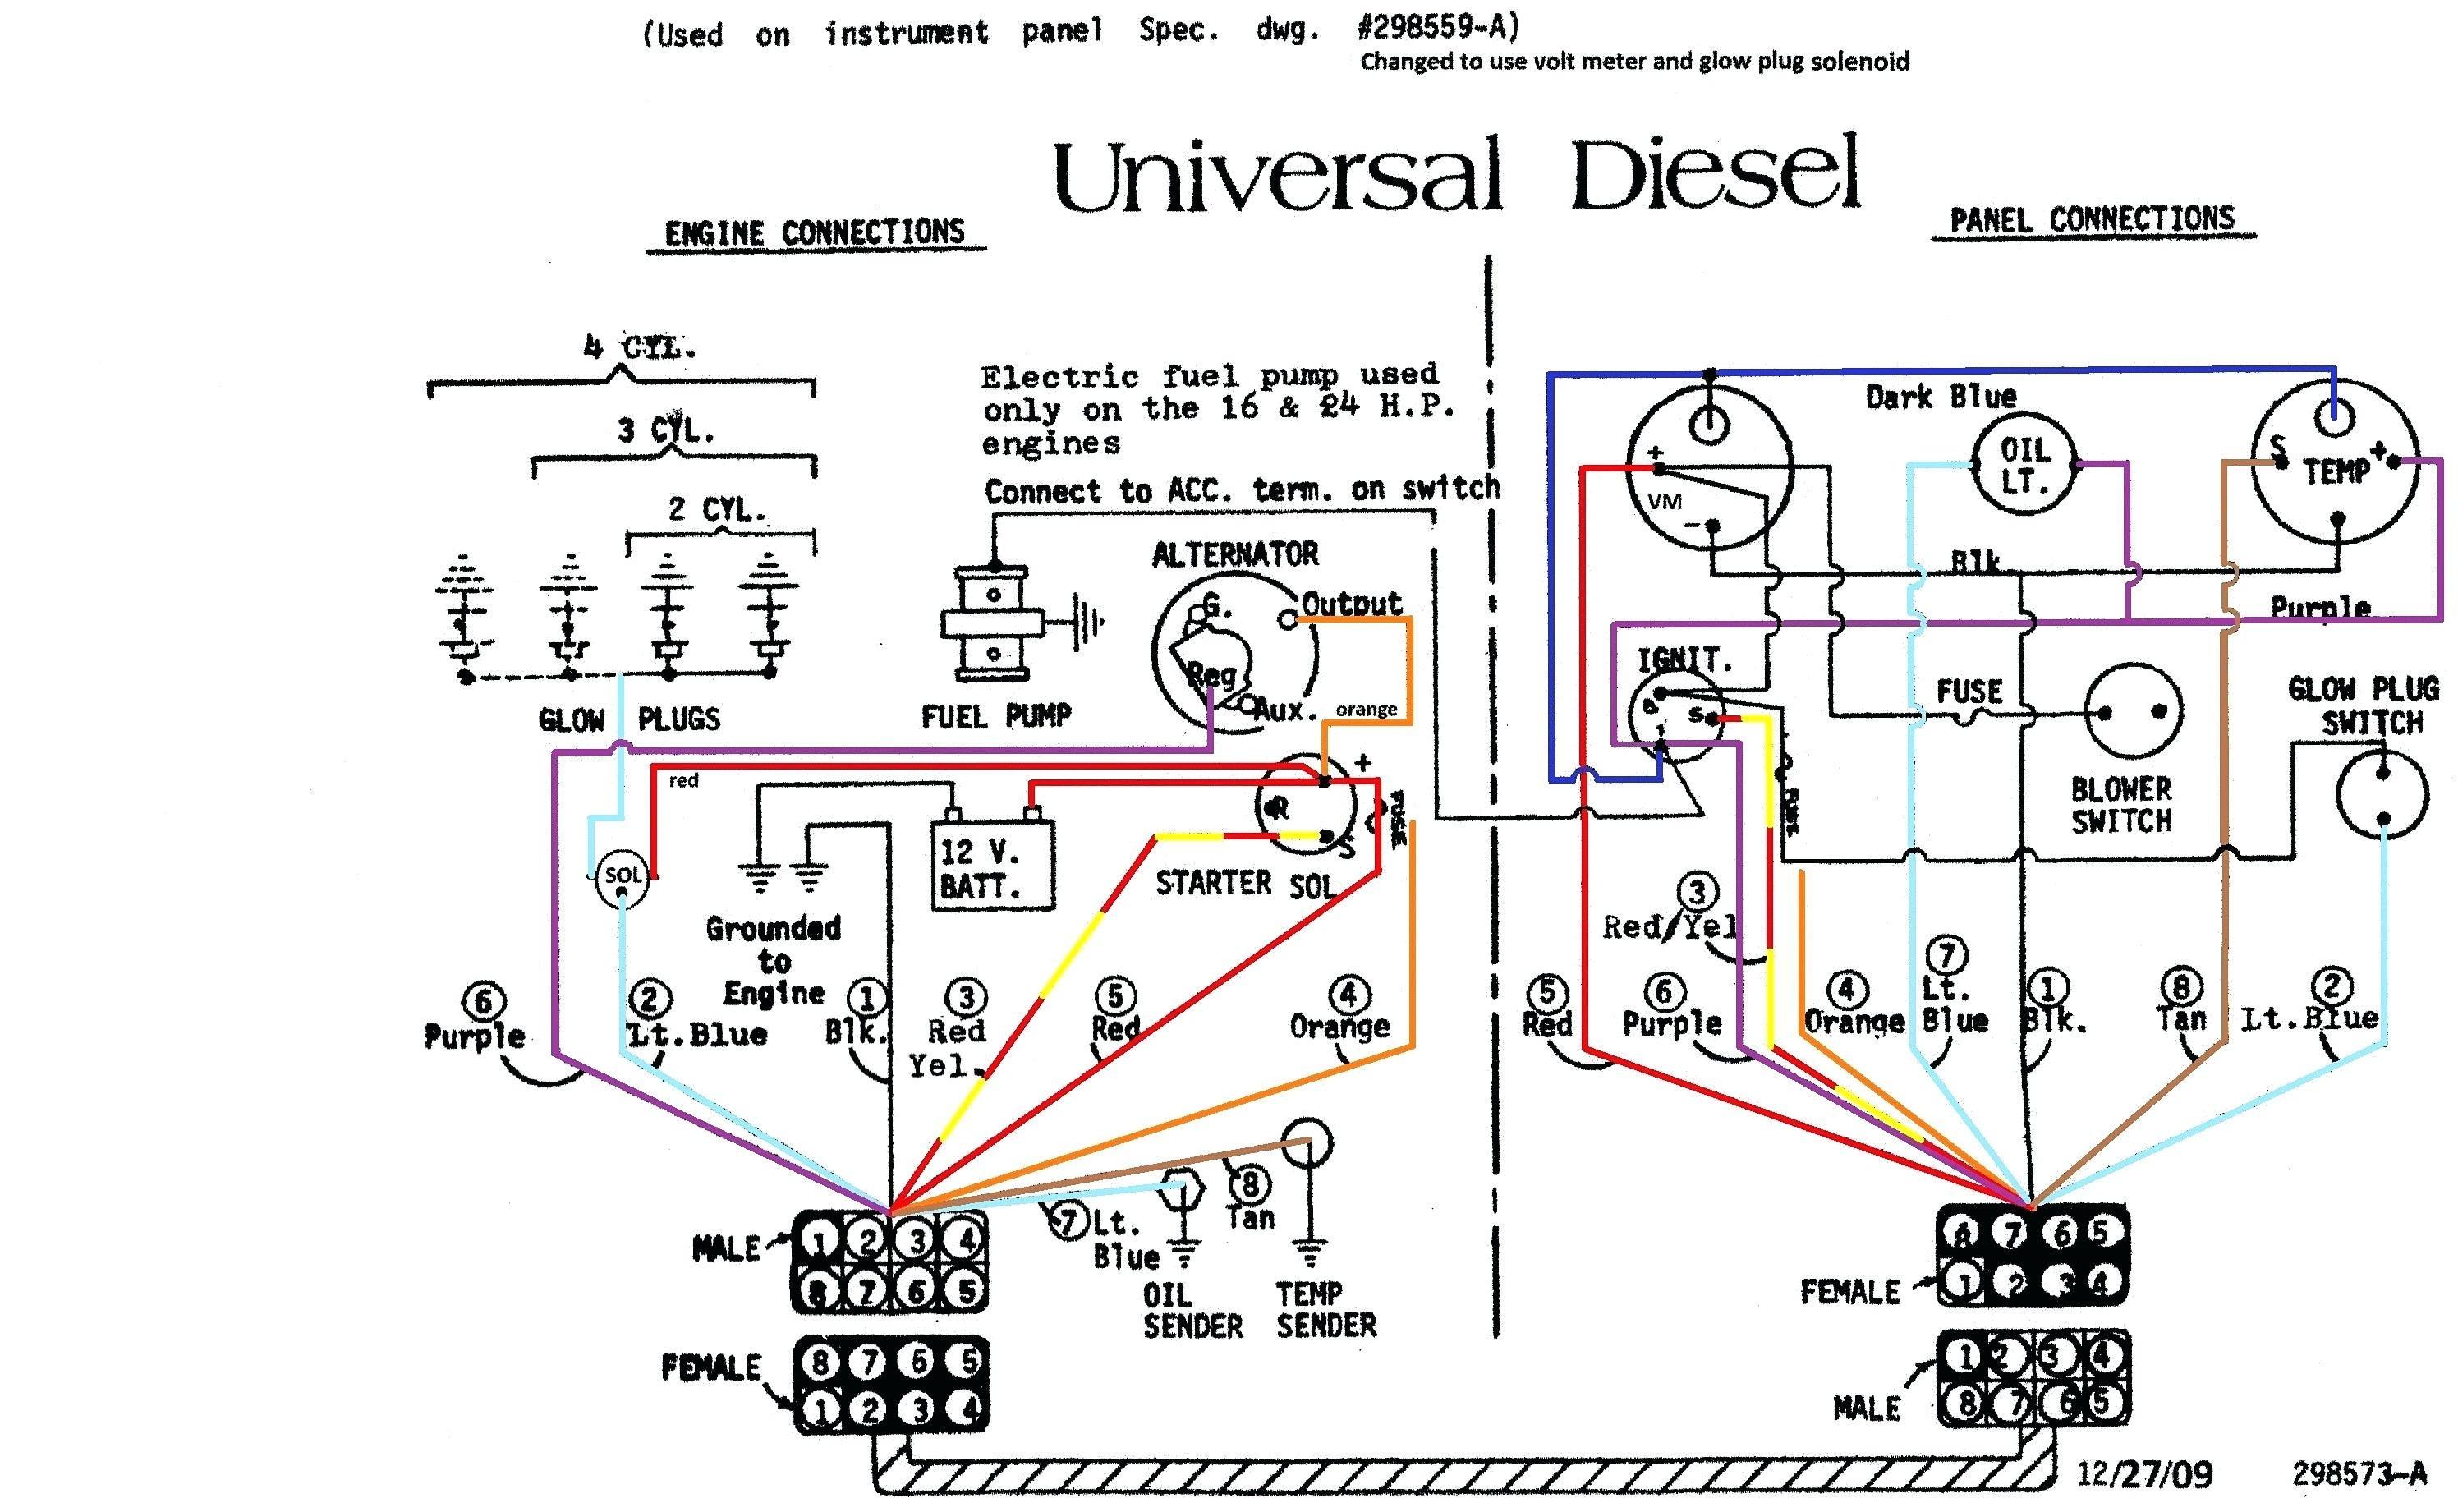 Df 7468 Diagram 7 Pin Trailer Wiring Diagram Trailer Plug Wiring Diagram 7 Way Schematic Wiring